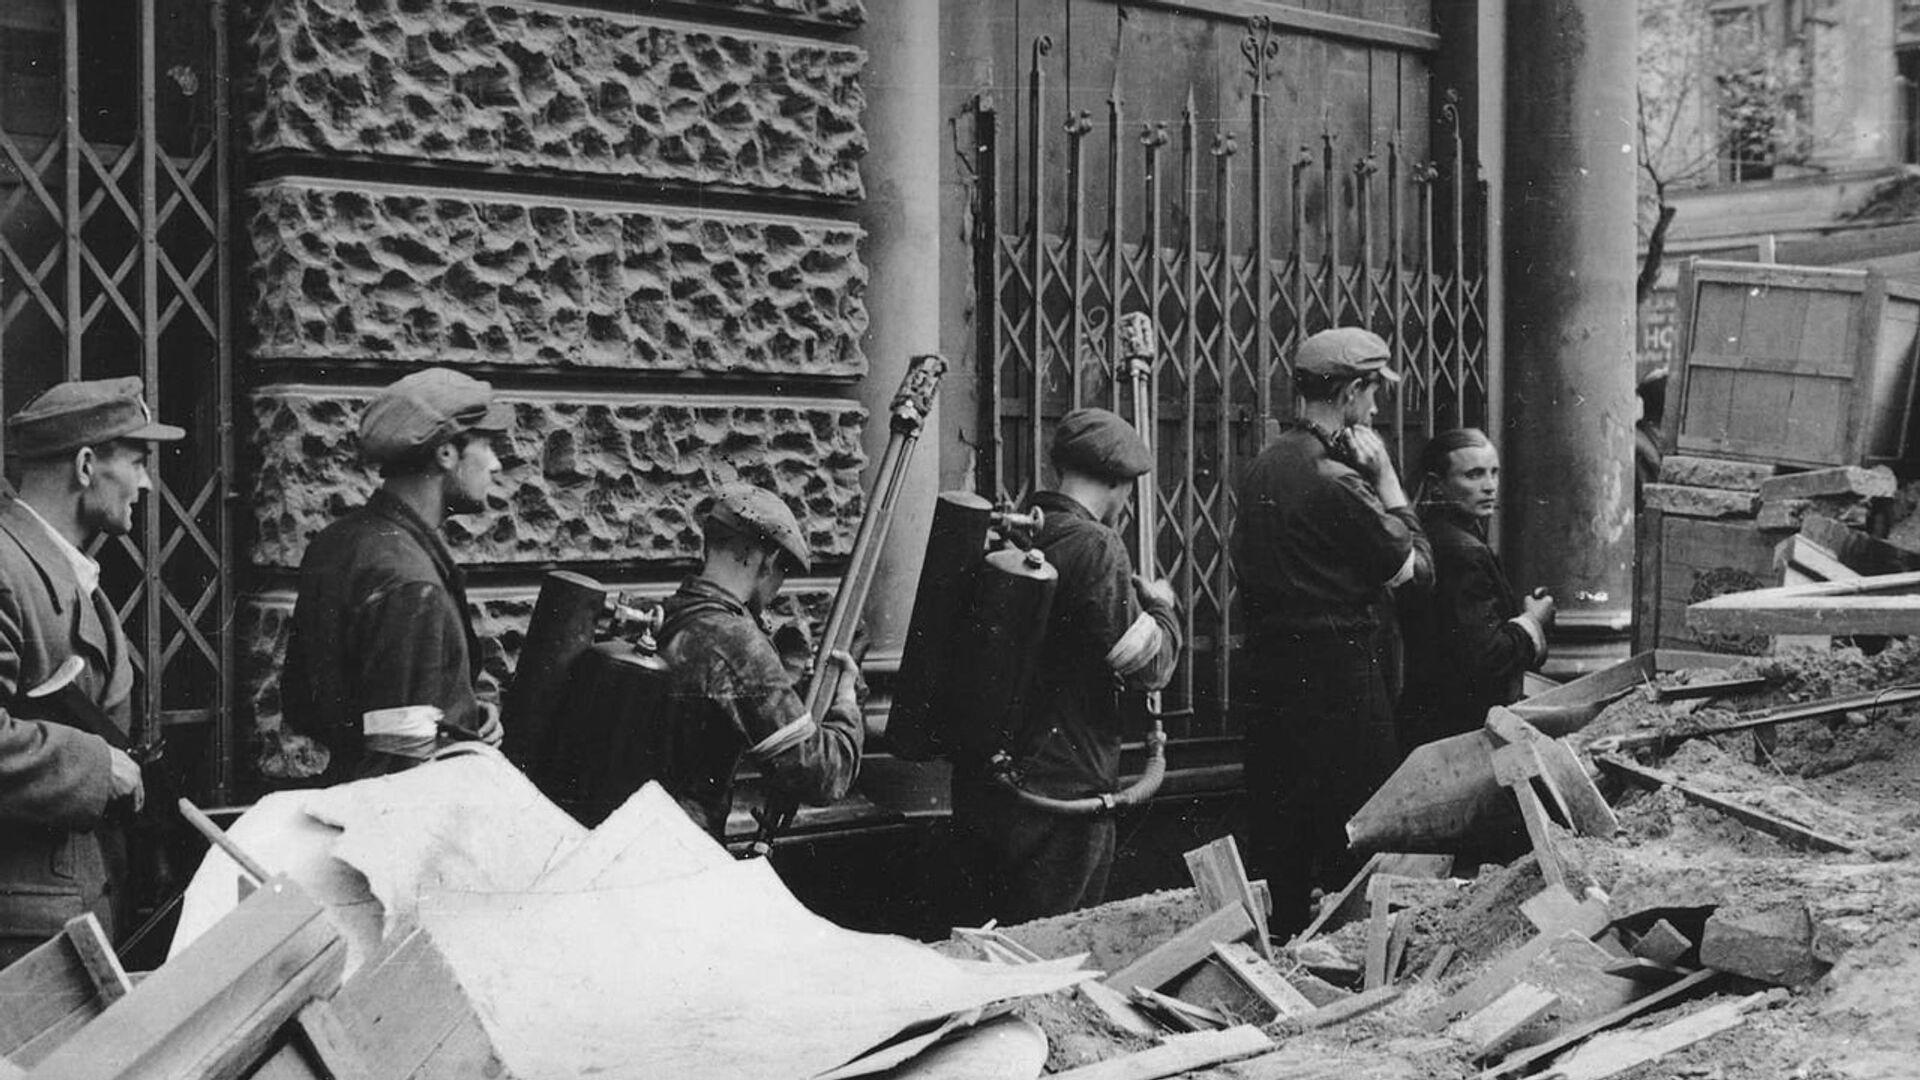 Огнеметчики восставших среди баррикад. Варшава, начало августа 1944 - РИА Новости, 1920, 01.08.2021